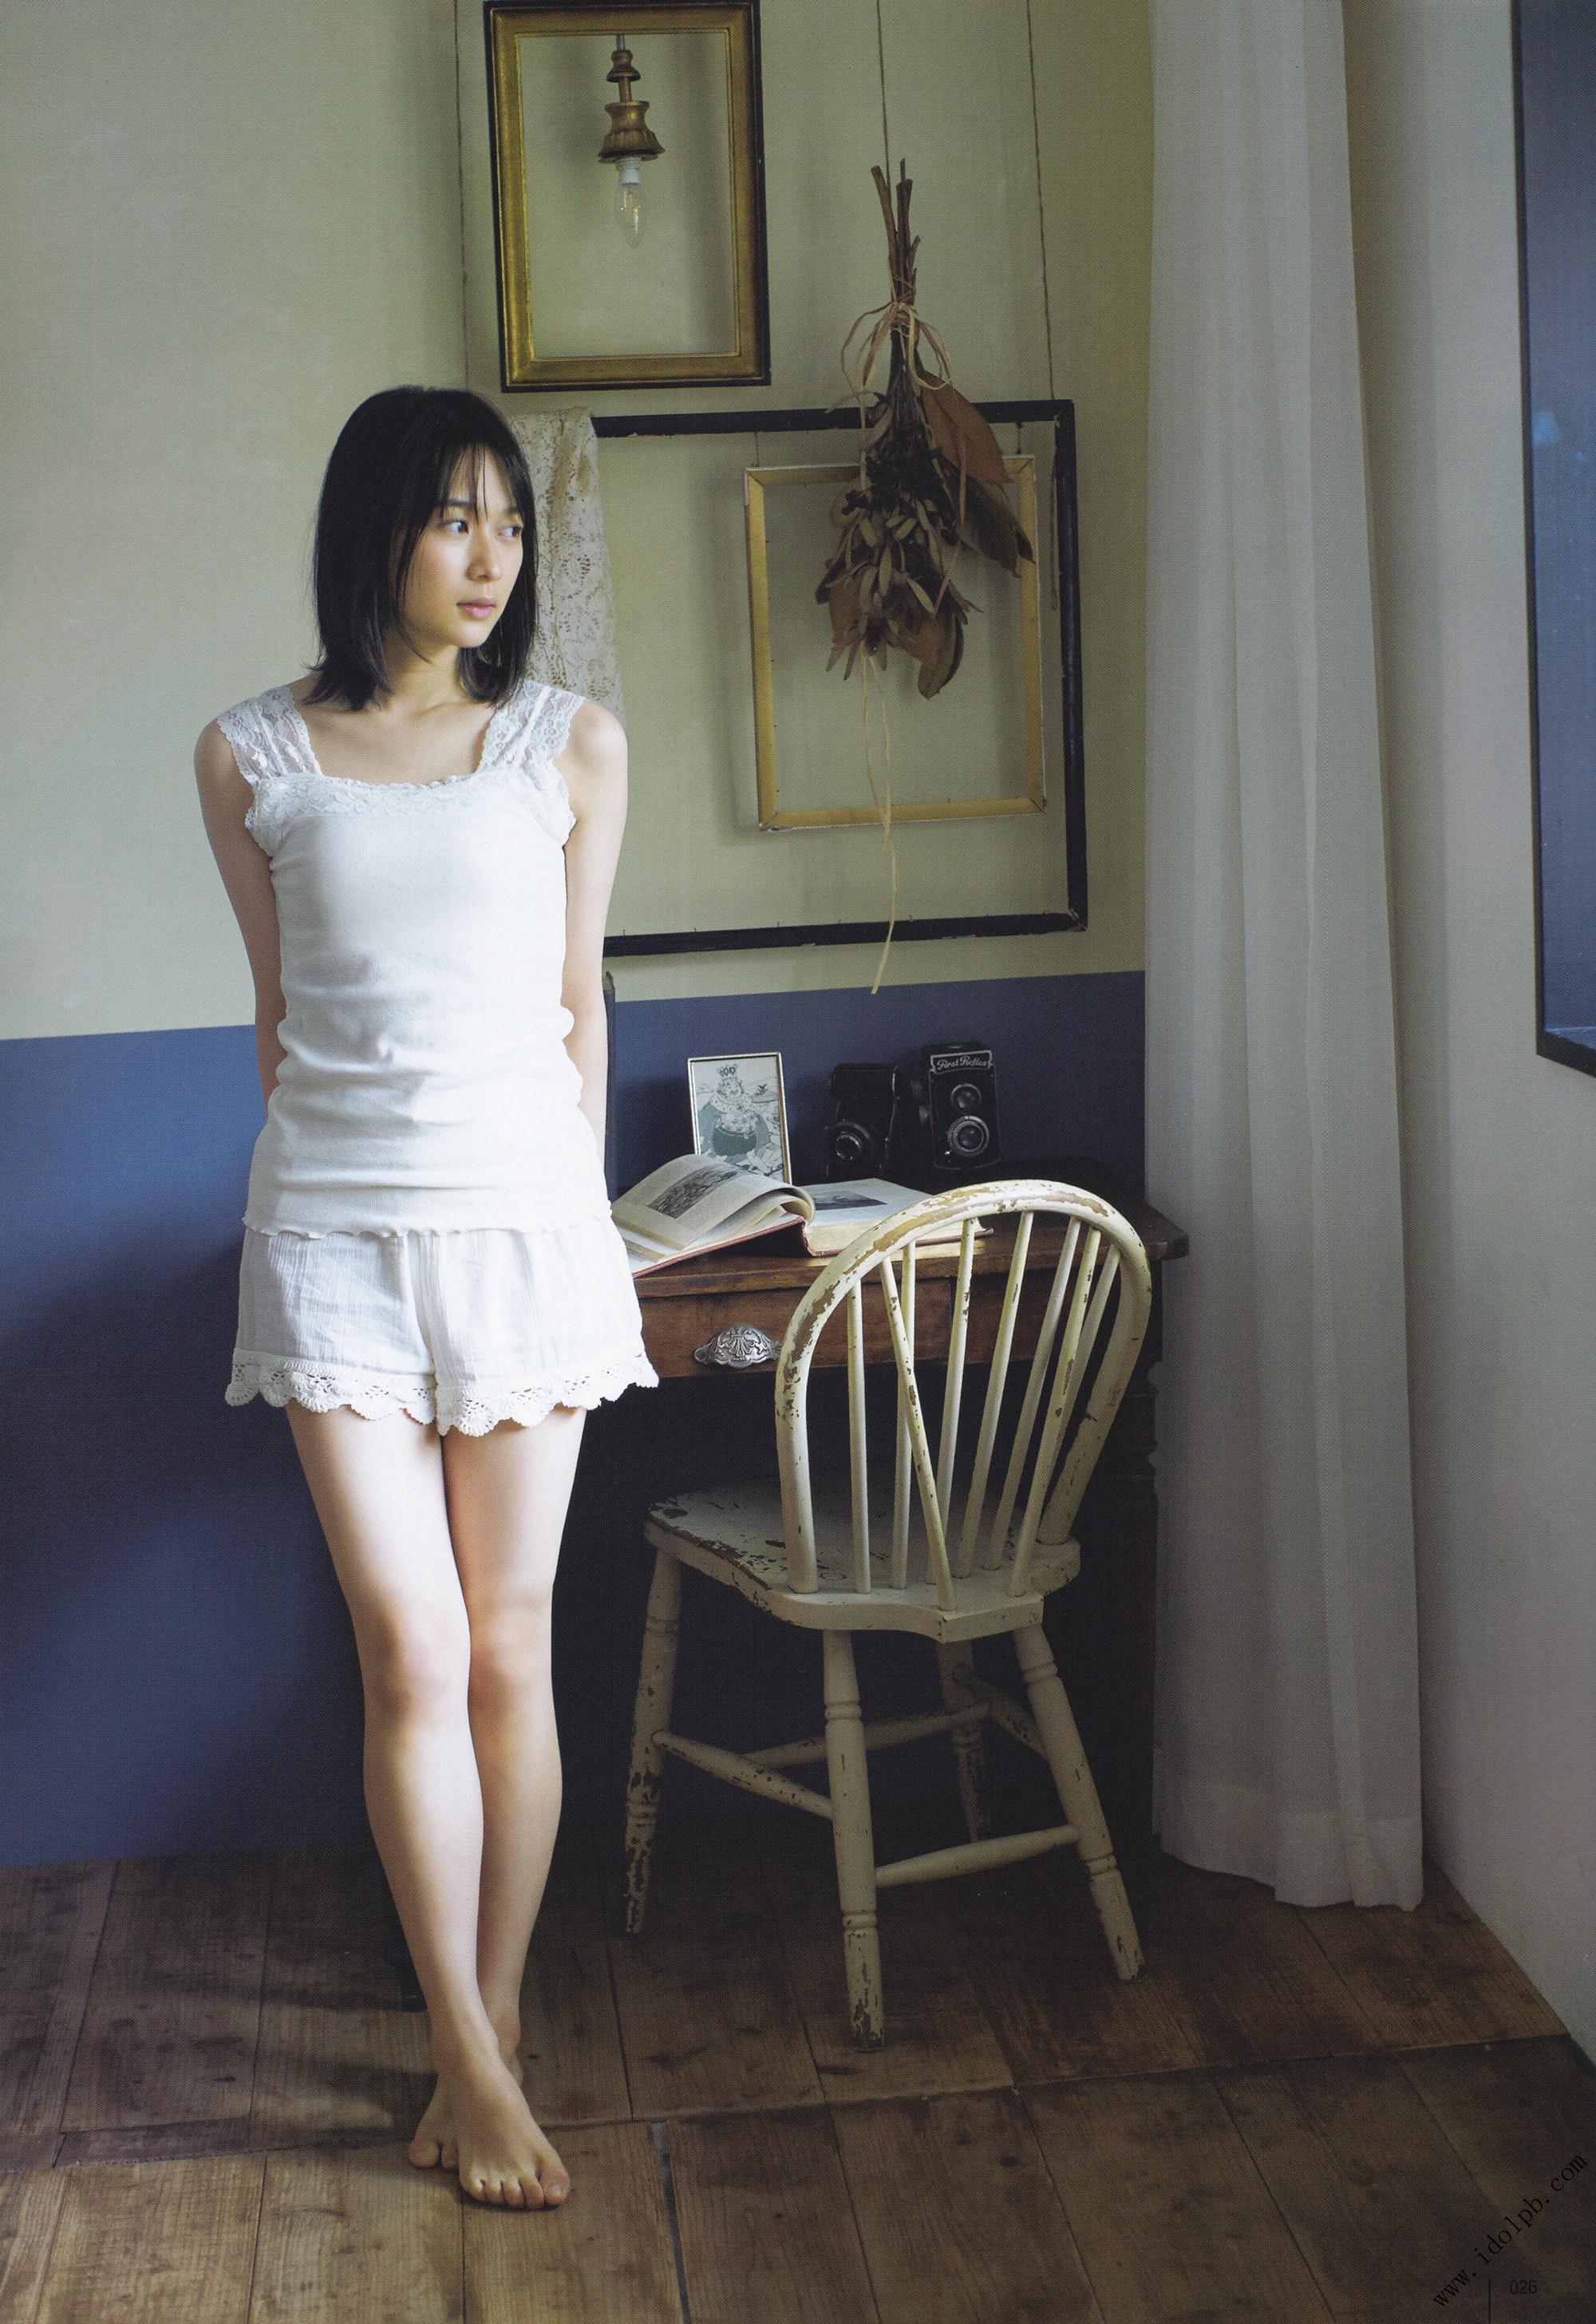 鈴木絢音の美脚画像